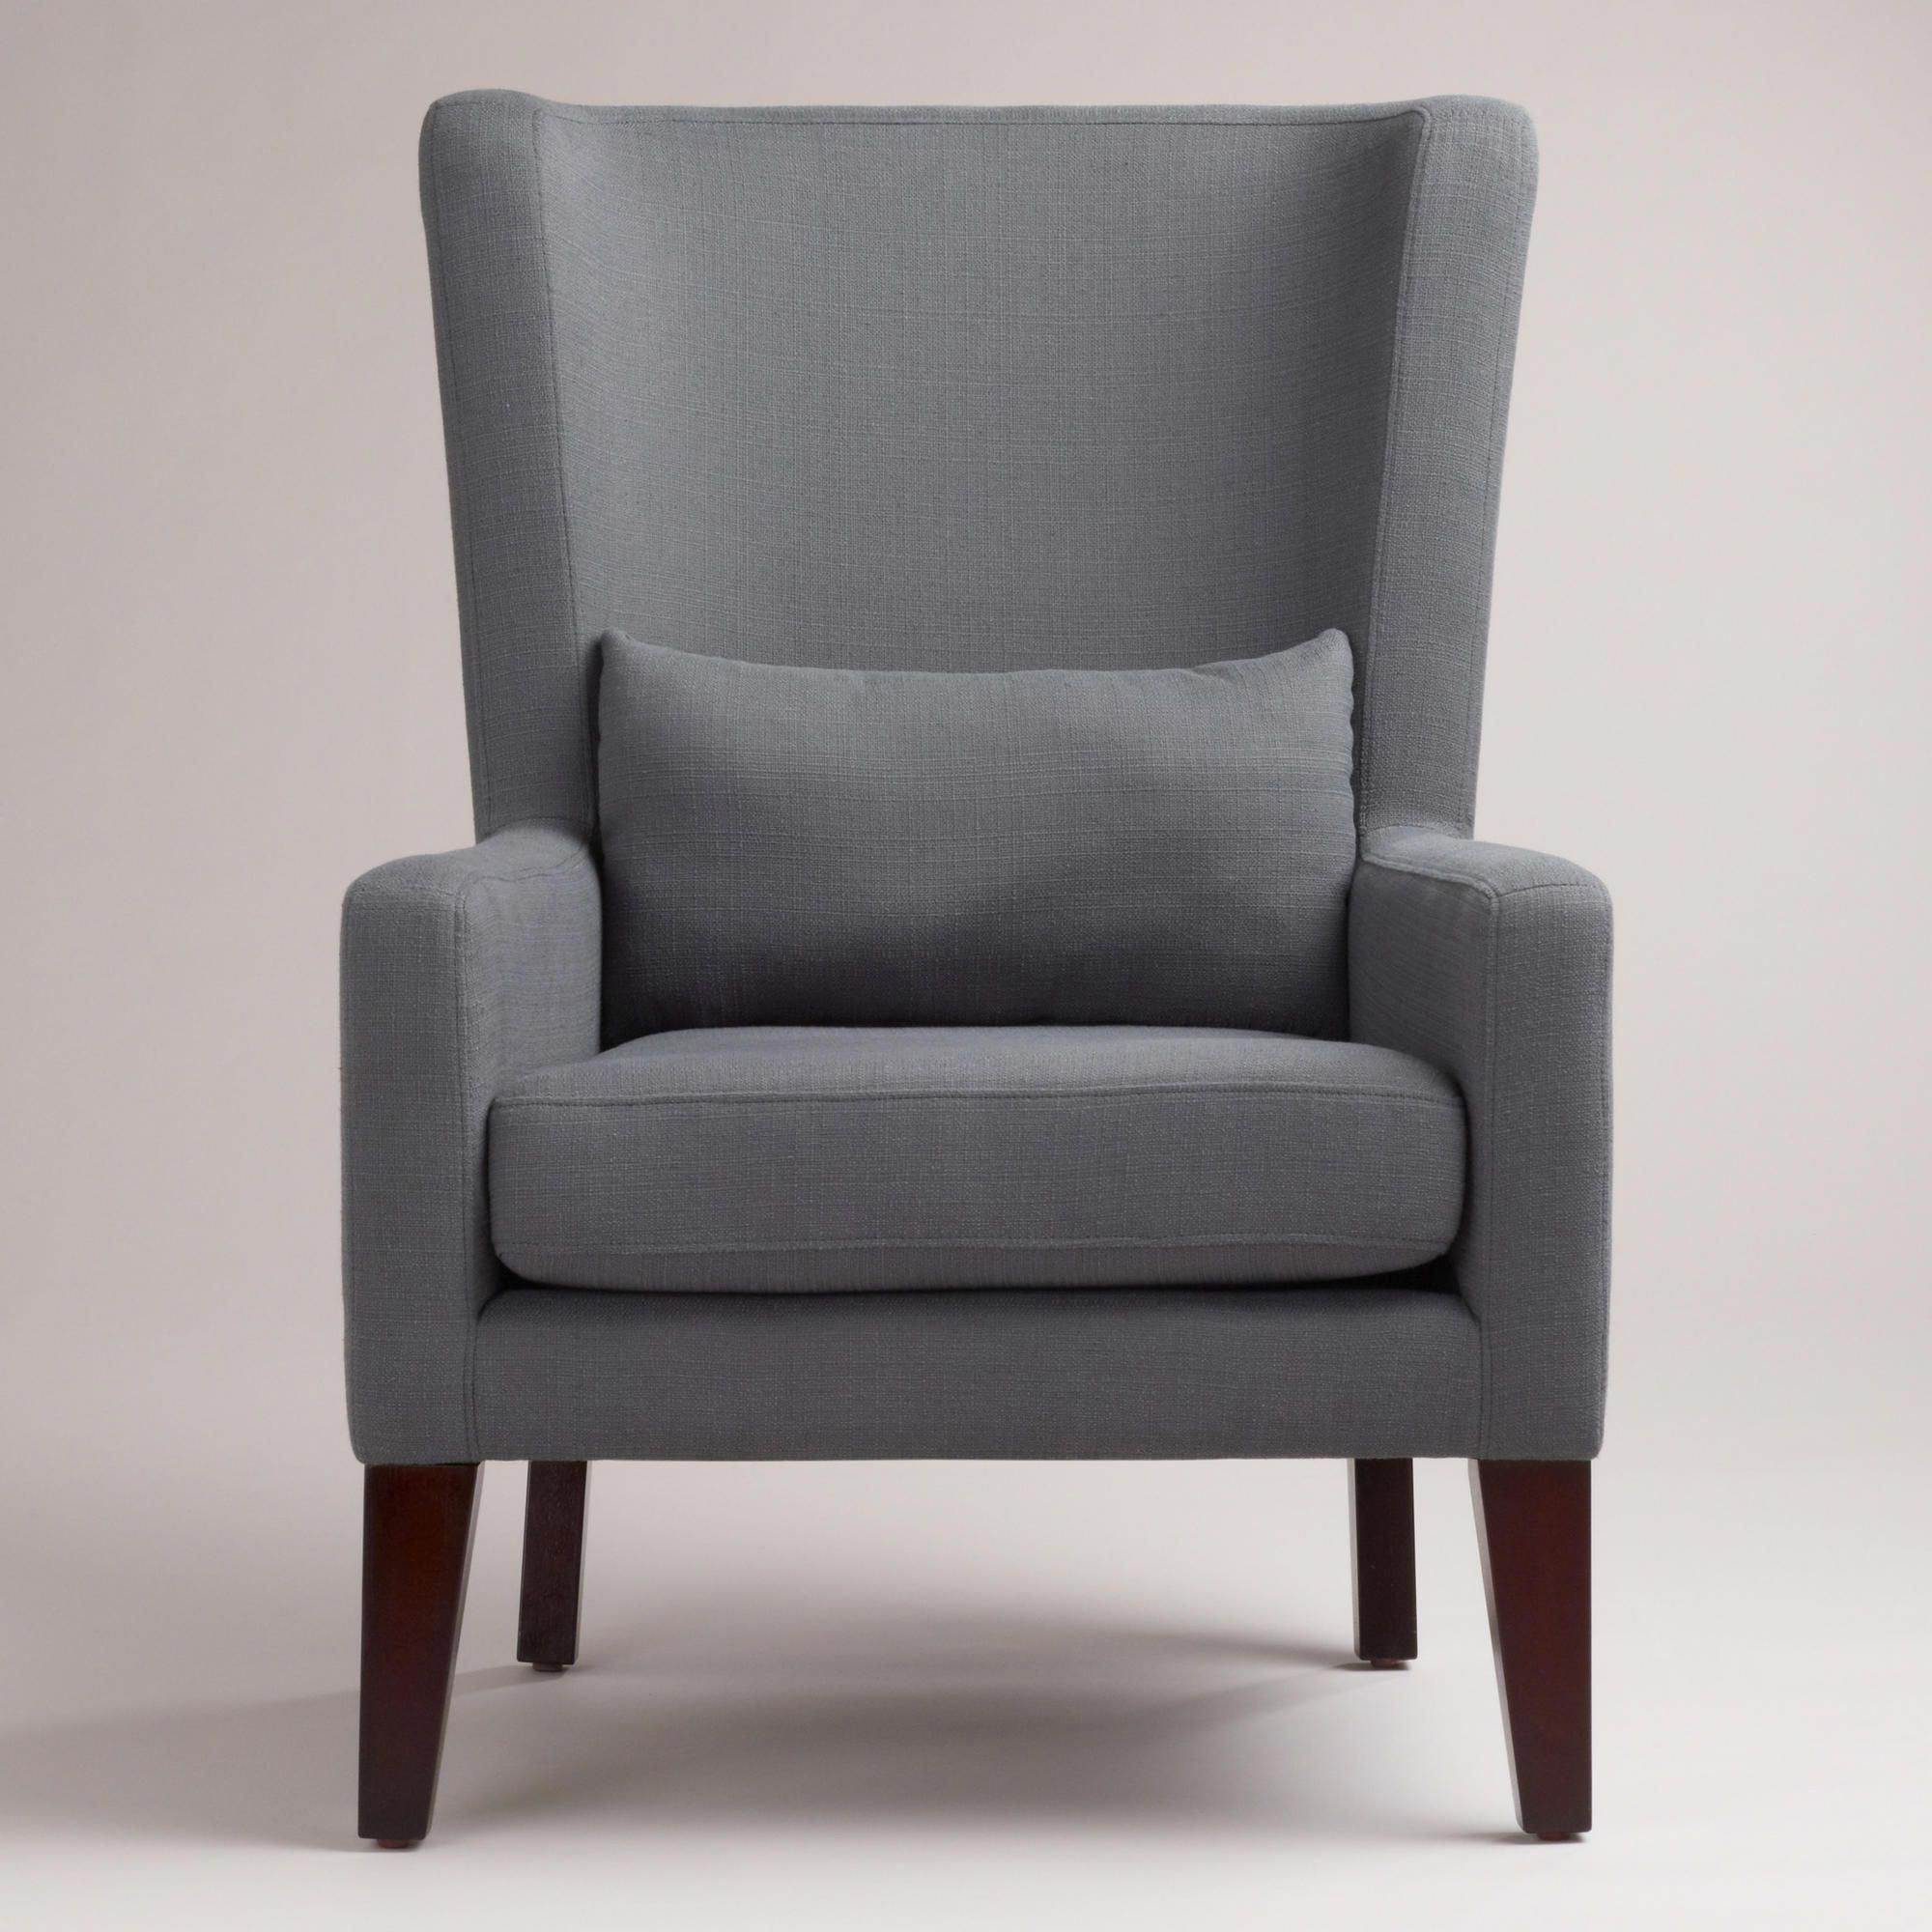 Dove gray triton high back chair world market 300 50